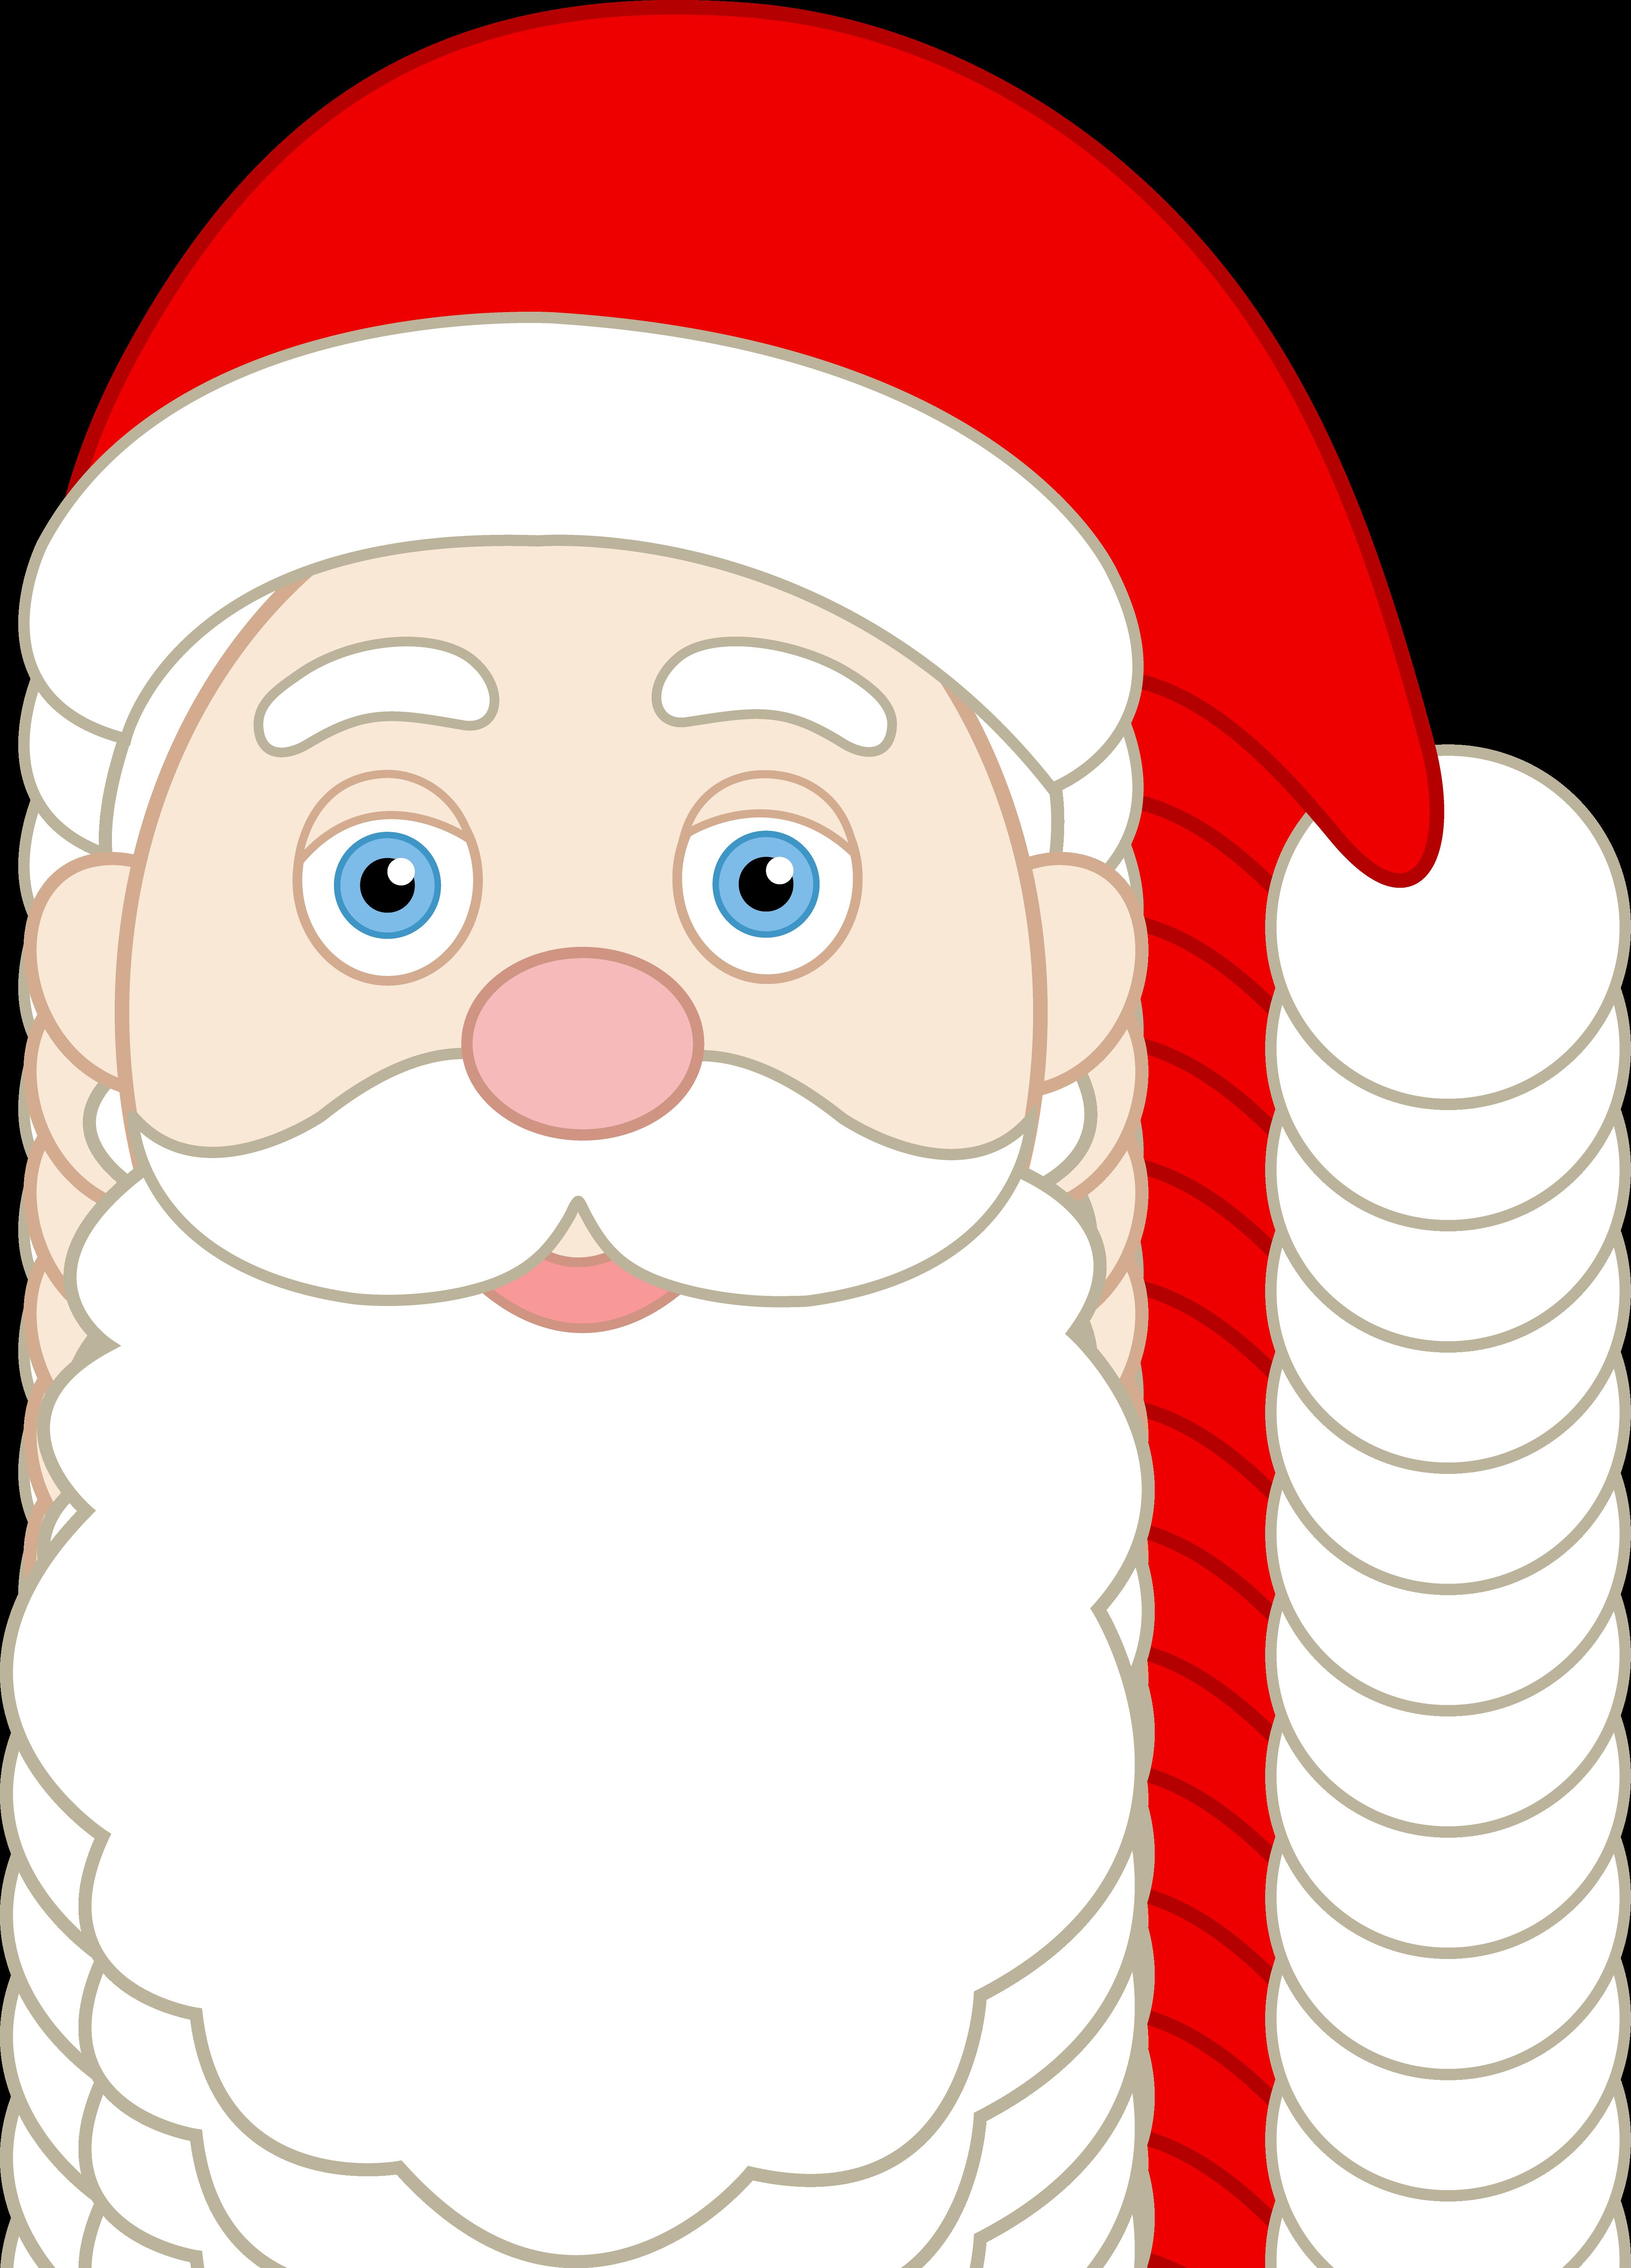 Face of Santa Claus - Free Clip Art